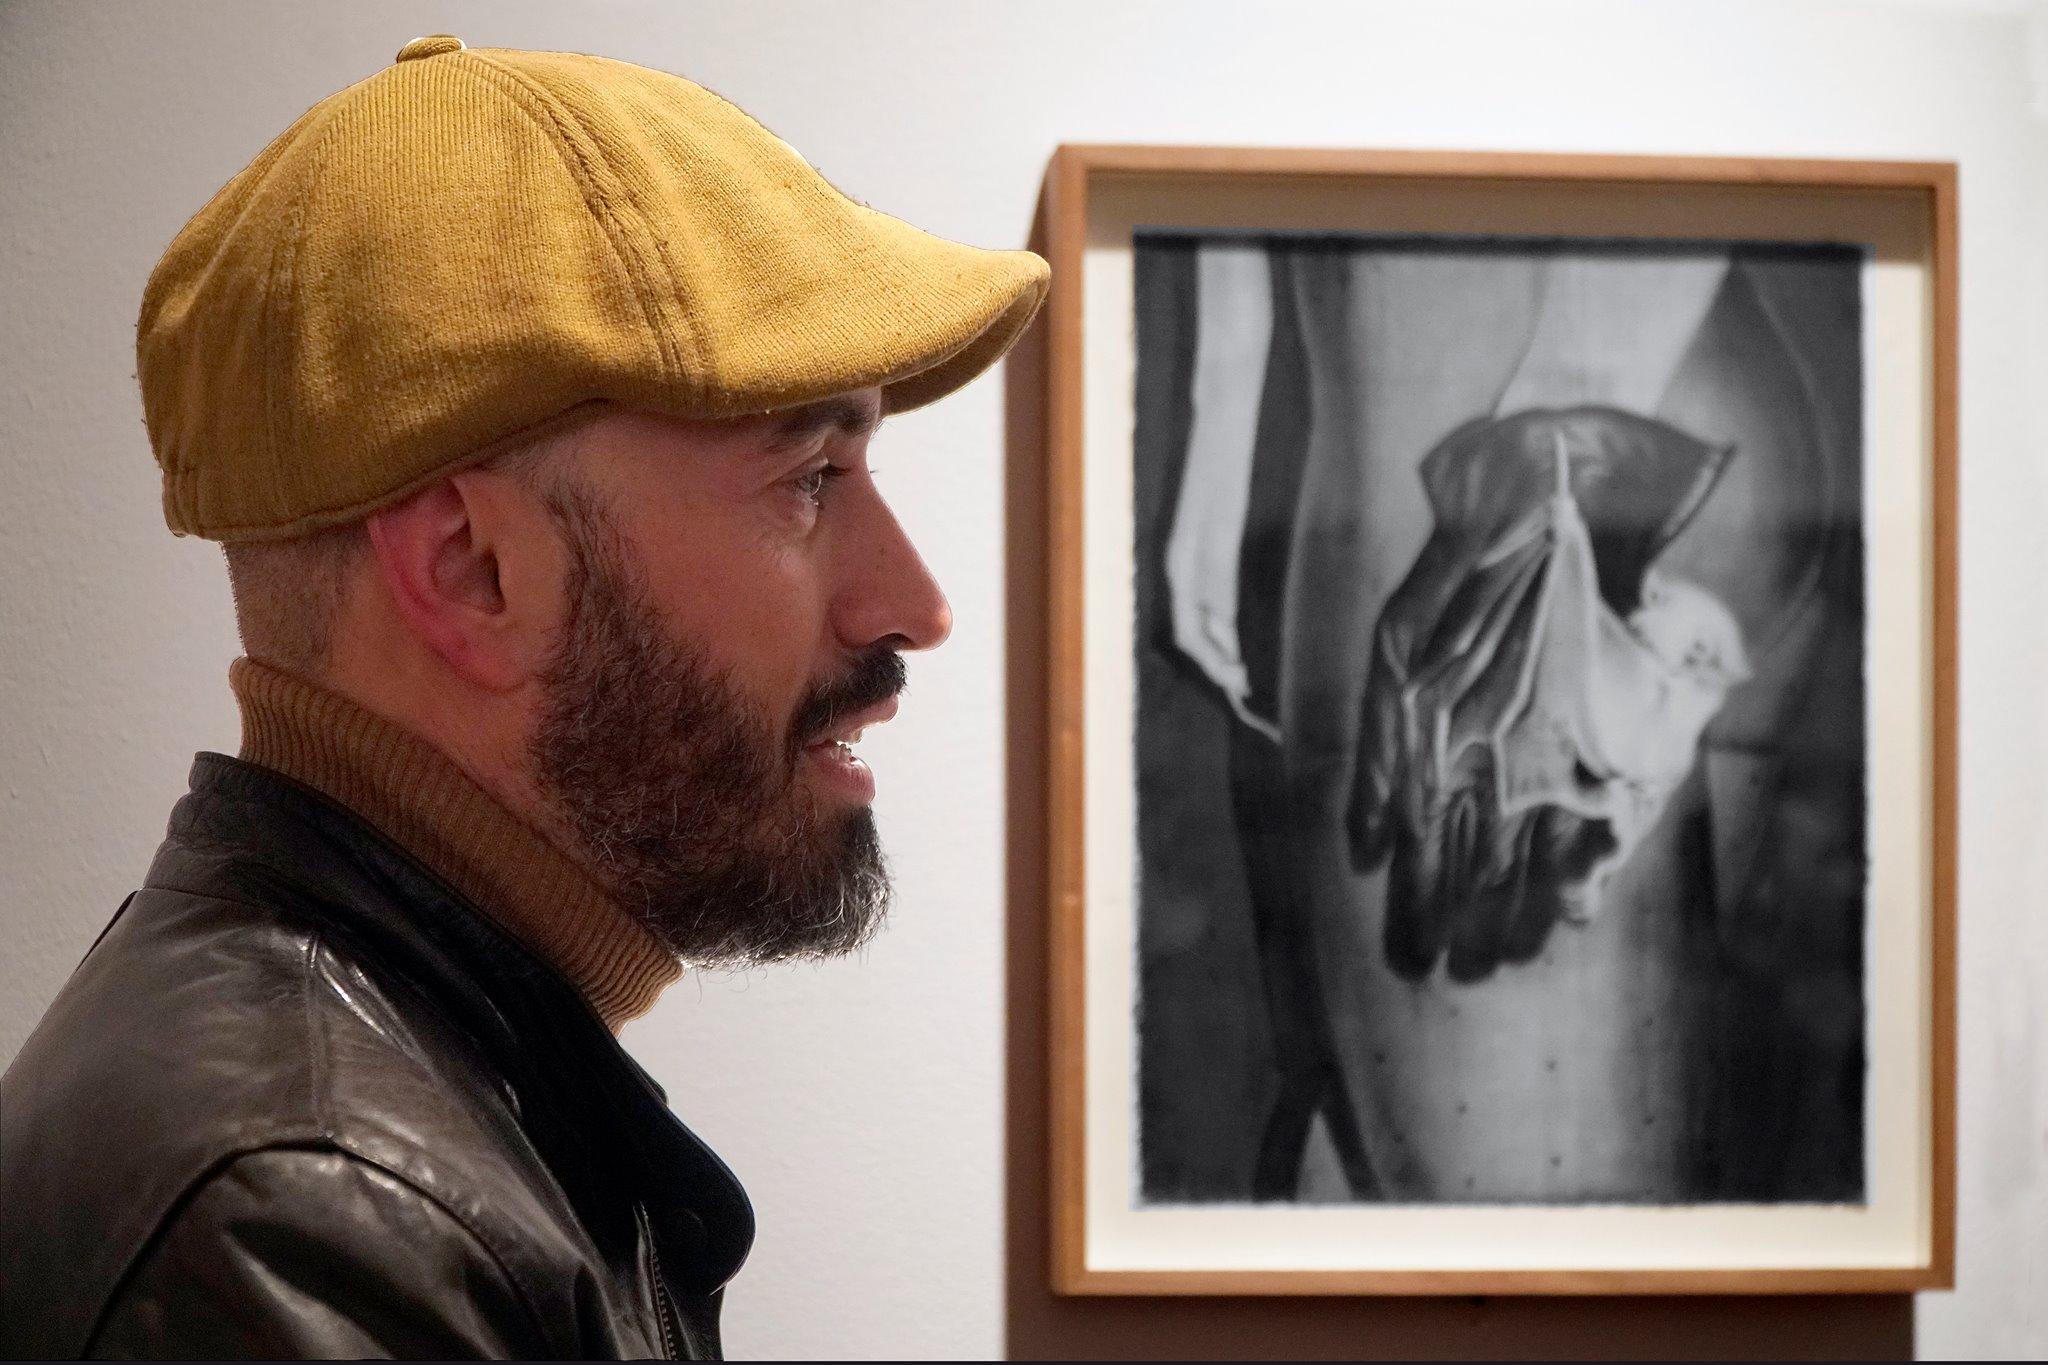 eldevenir-art-gallery-rafel-jimenez-jose-luis-puche-la-termica-malaga-z-eldevenir.jpg